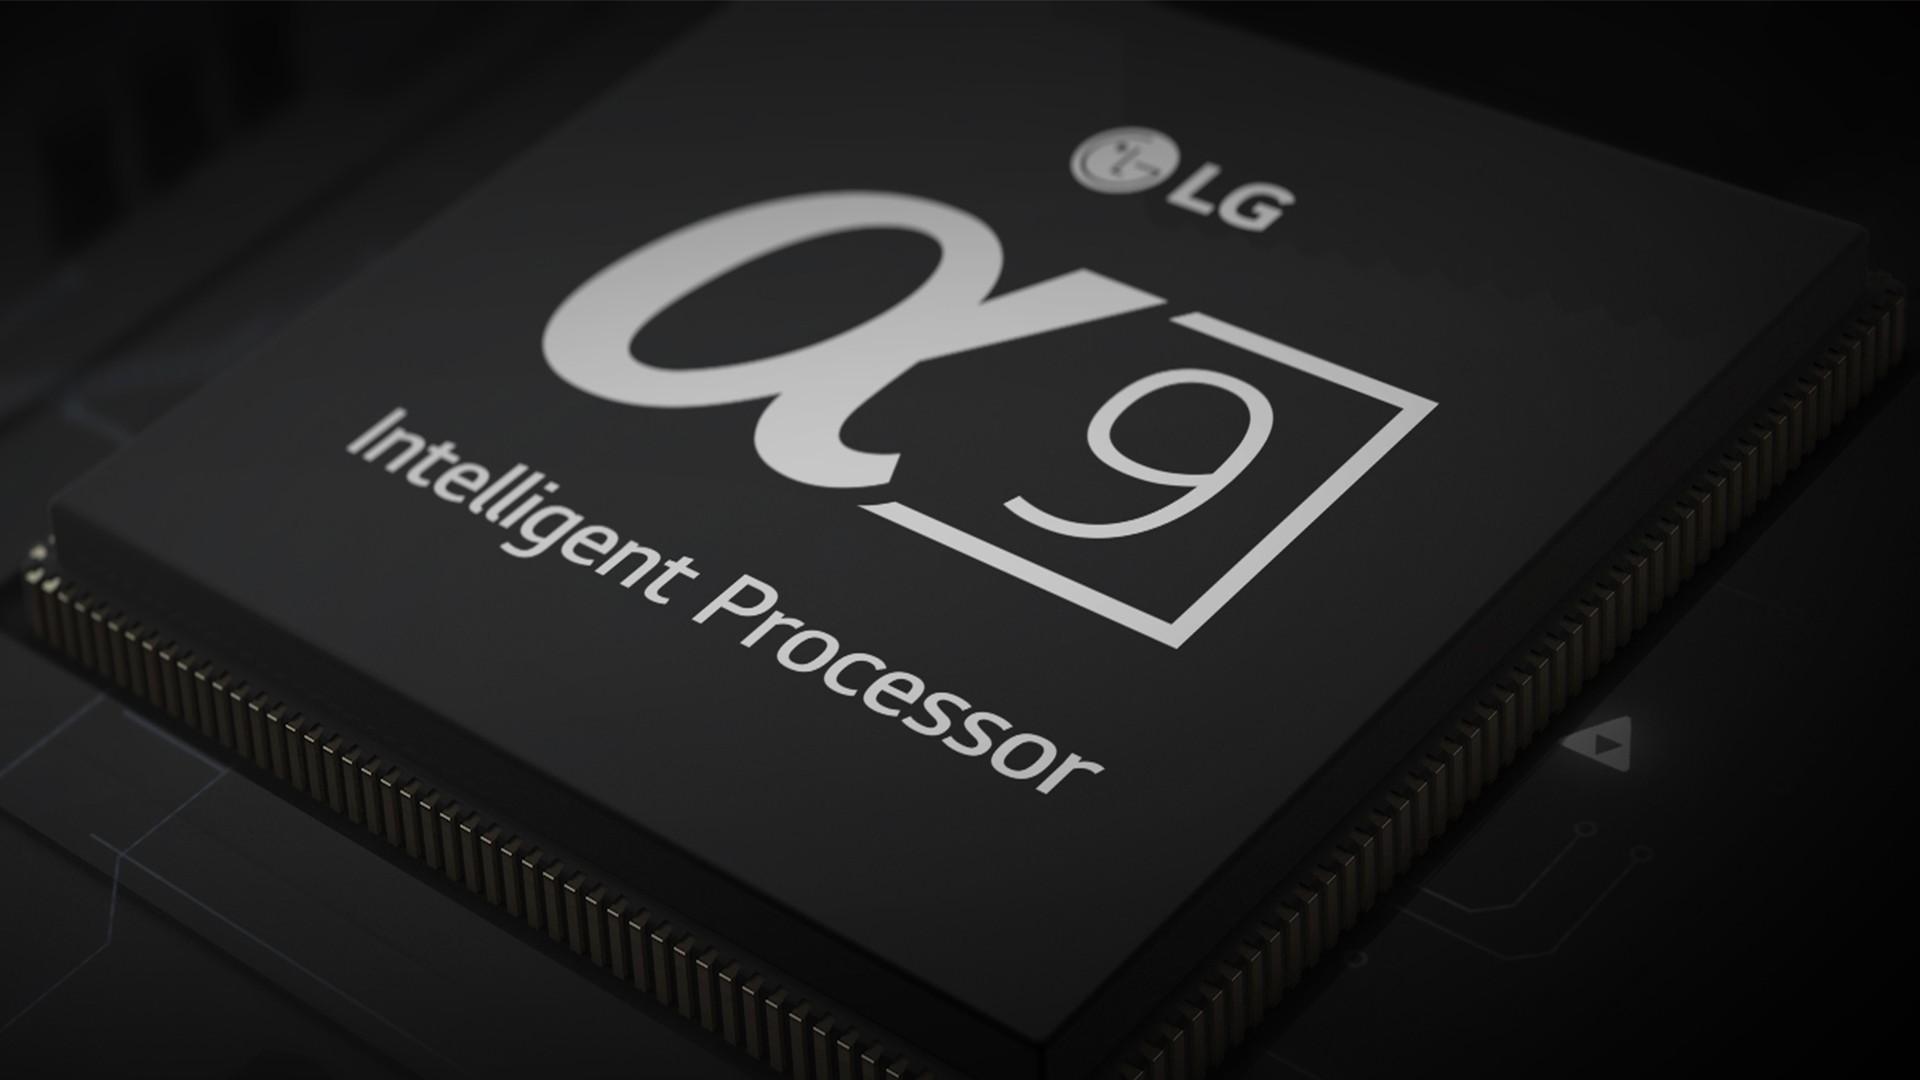 LG a9 intelligent processor